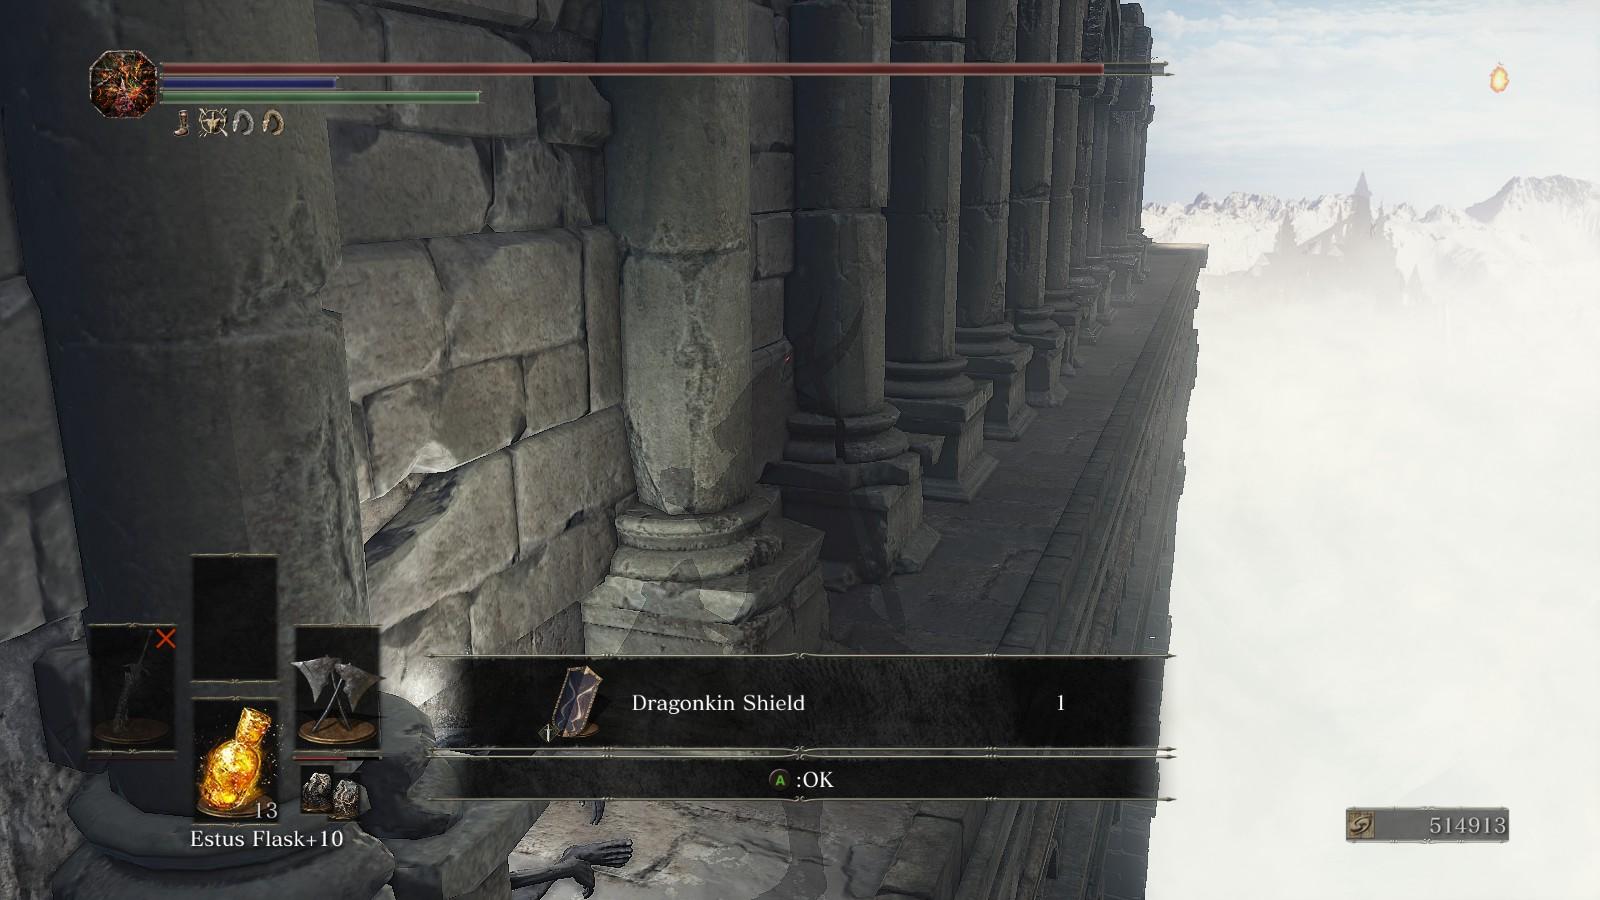 dragonkin-shield.jpg